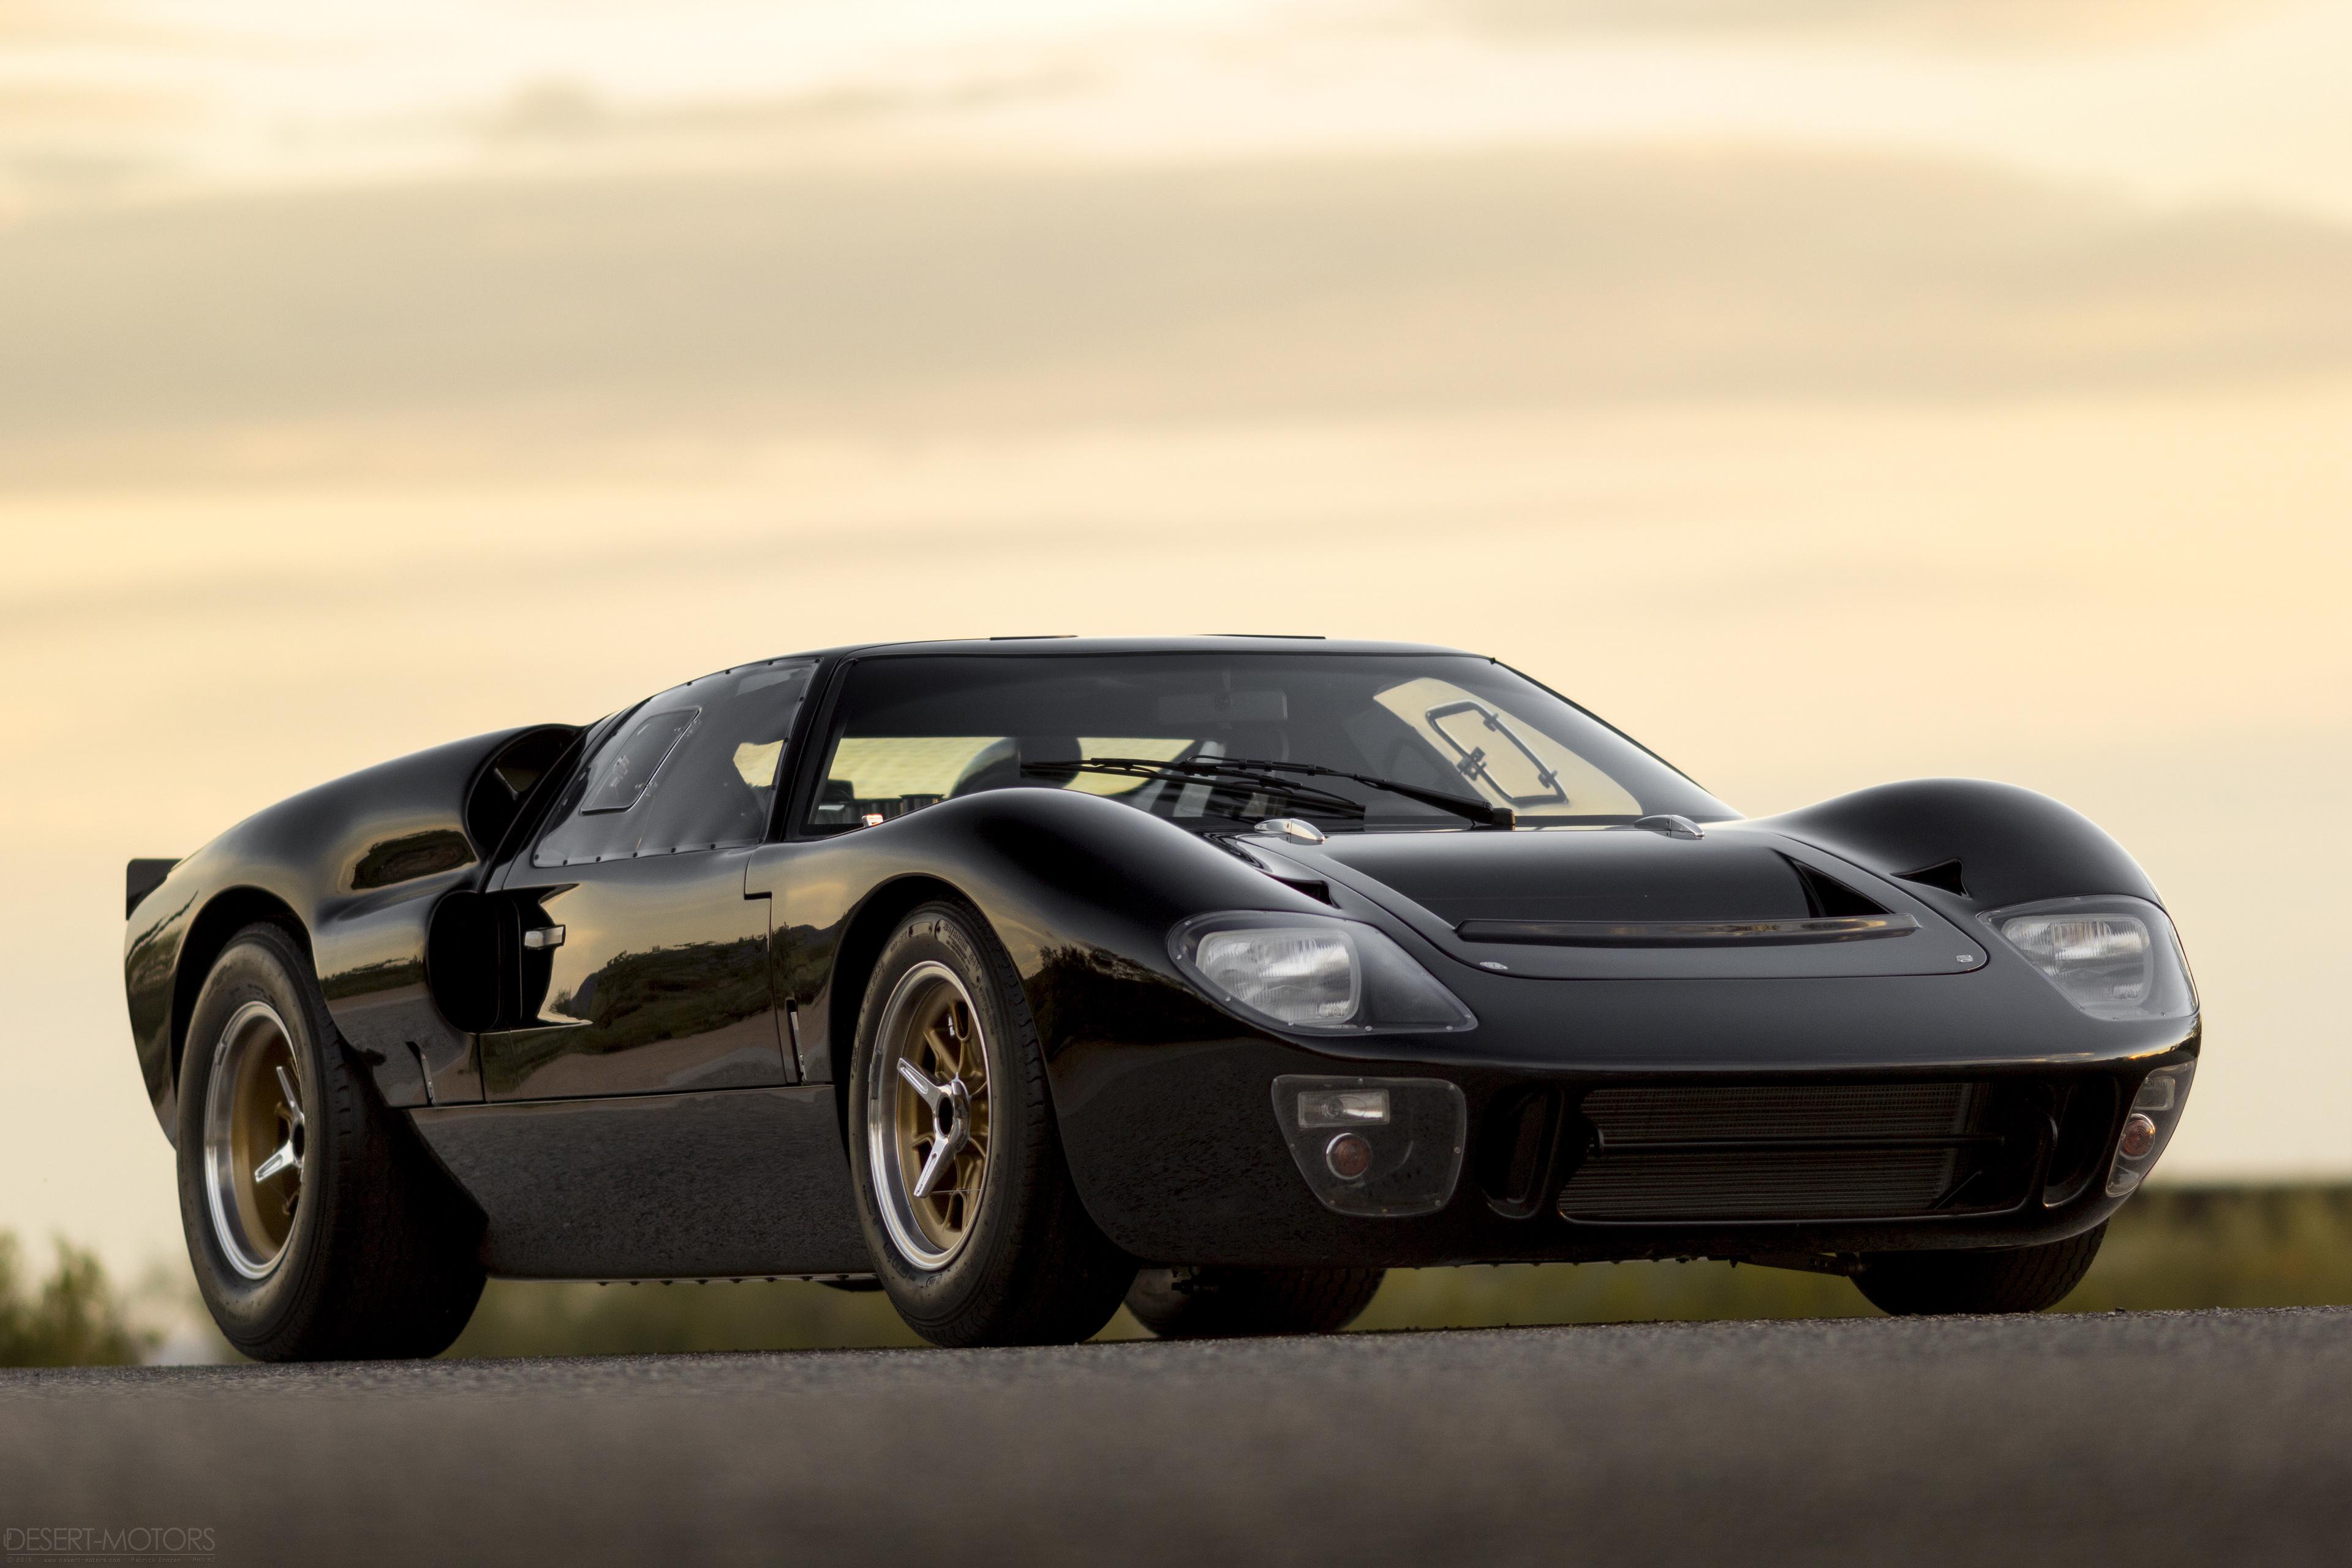 Phoenix Used Cars >> 1965 Ford Superformance GT40 | Desert-Motors.com